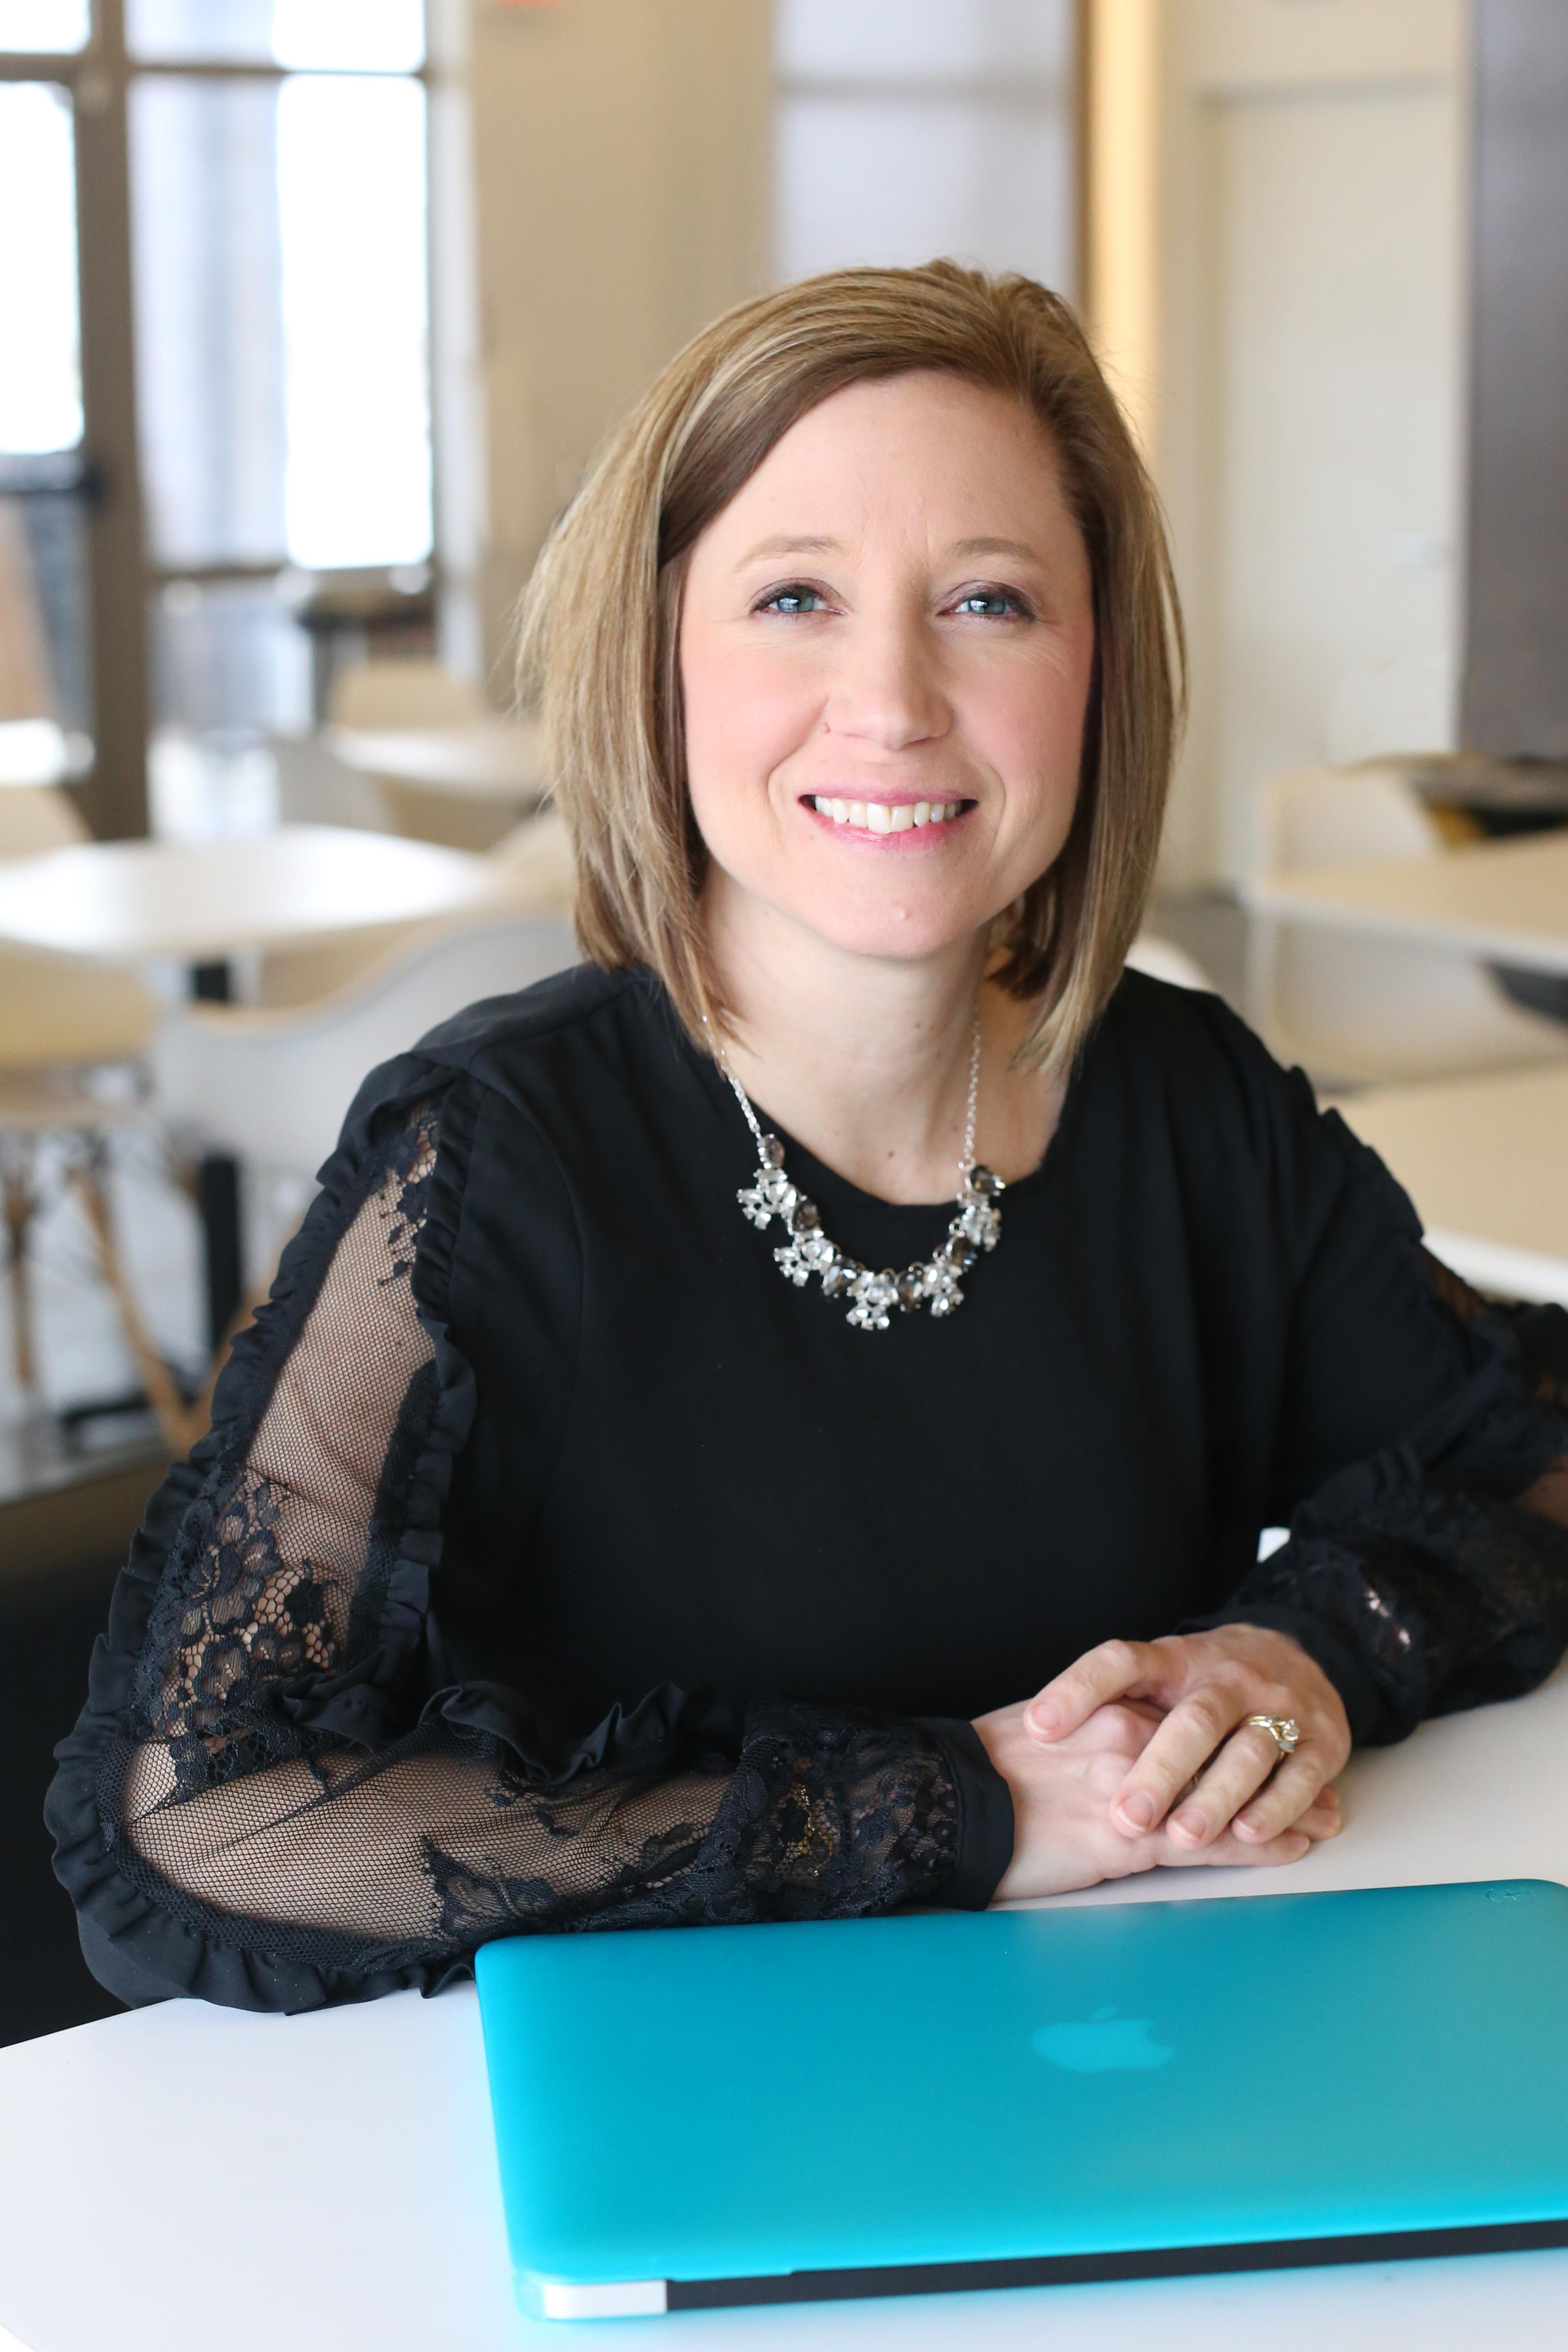 Stacey Regennitter, Director of Development